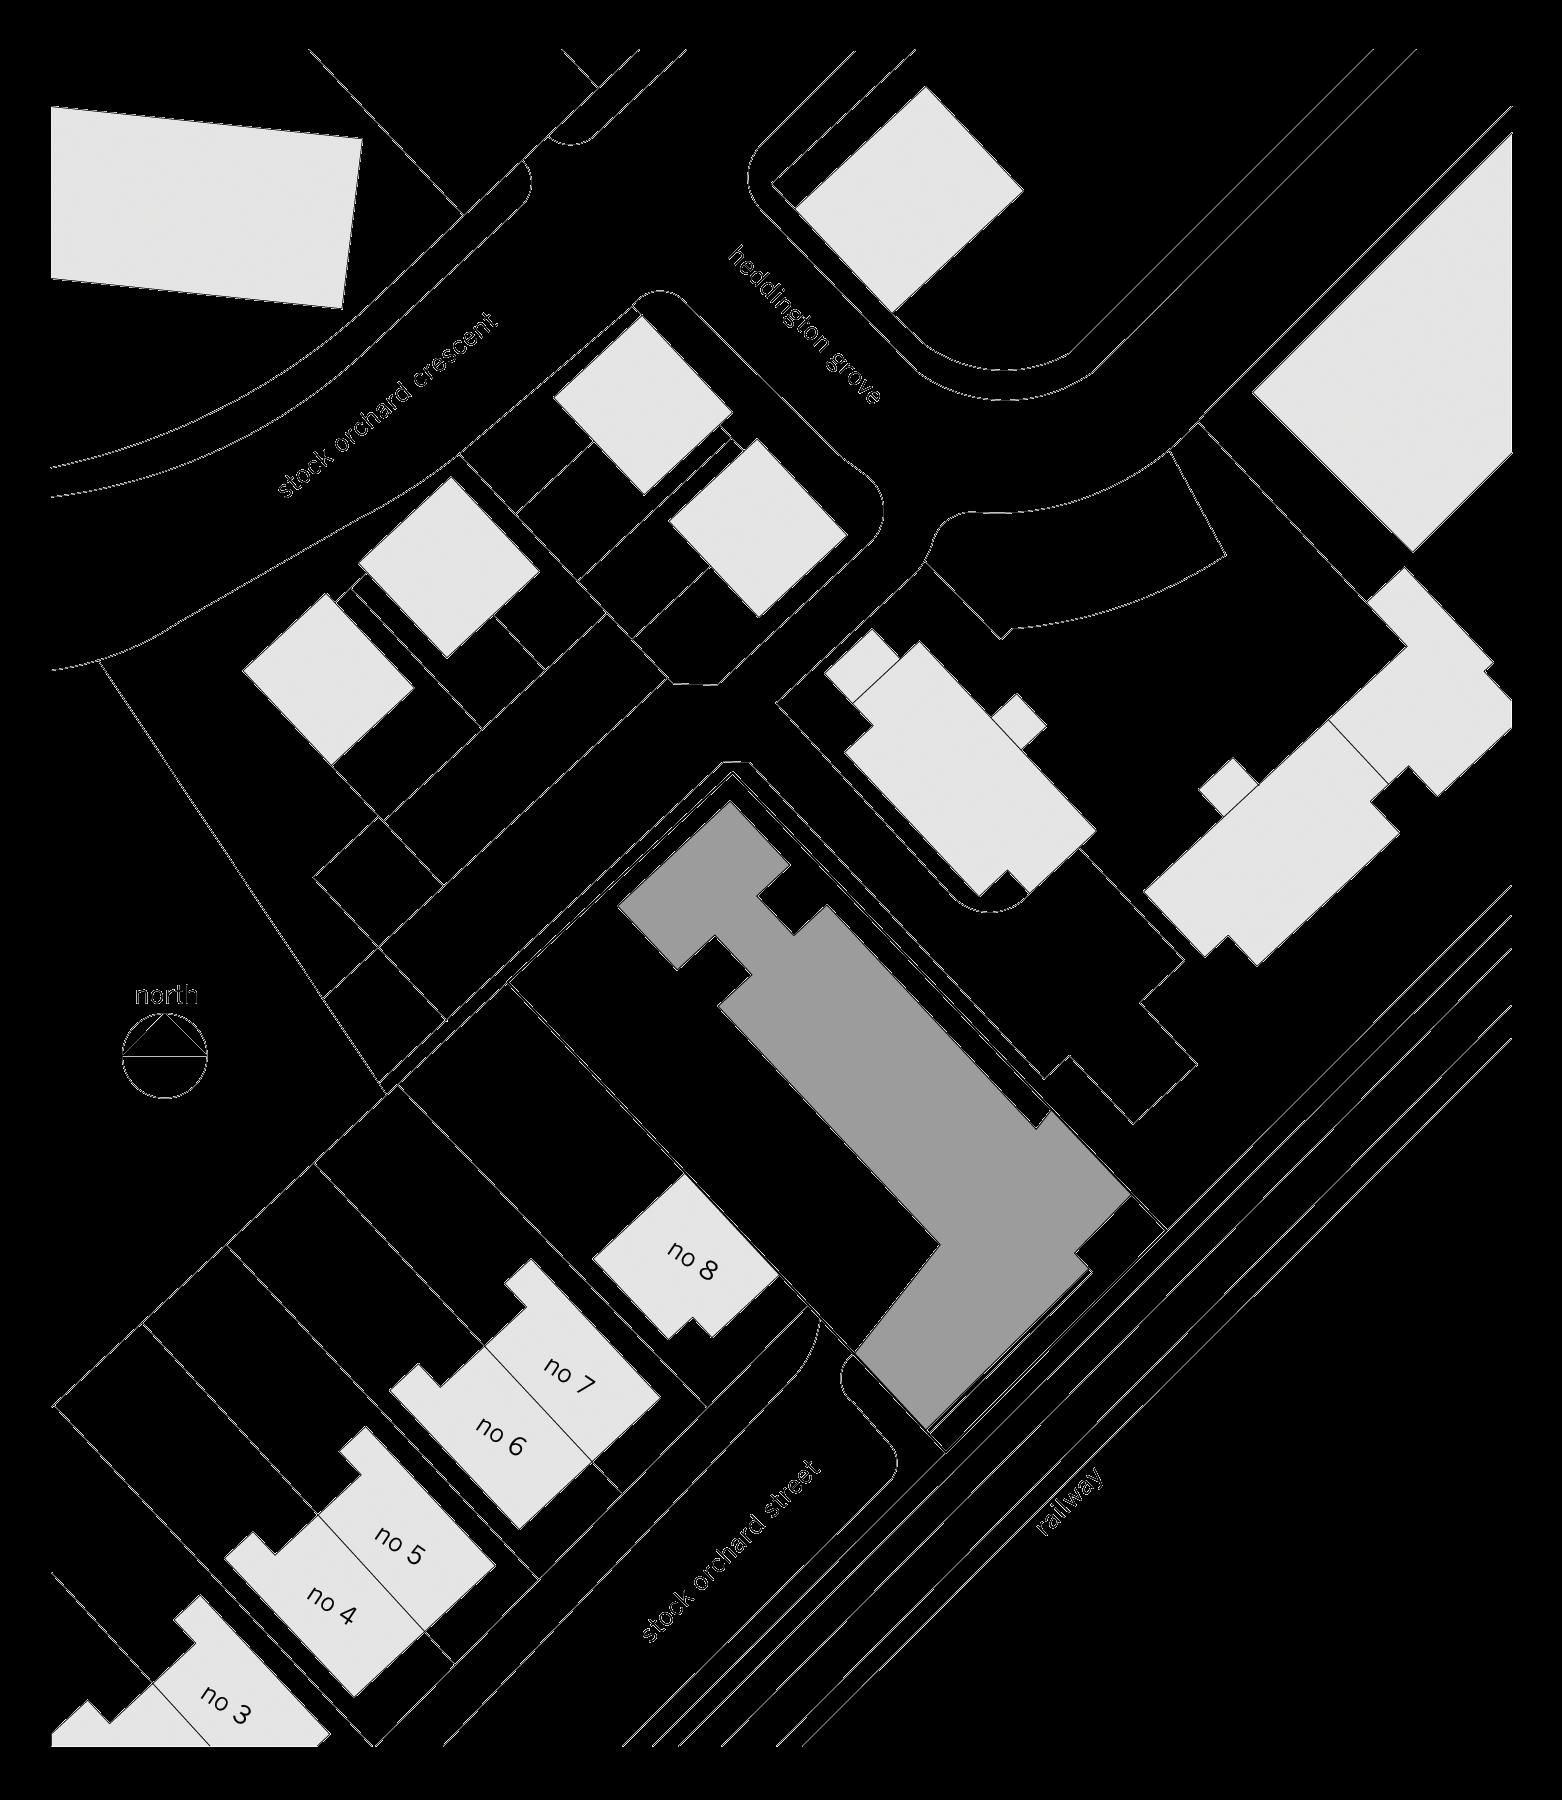 Sarah-Wigglesworth-Architects Stock-Orchard-Street site-plan 1800